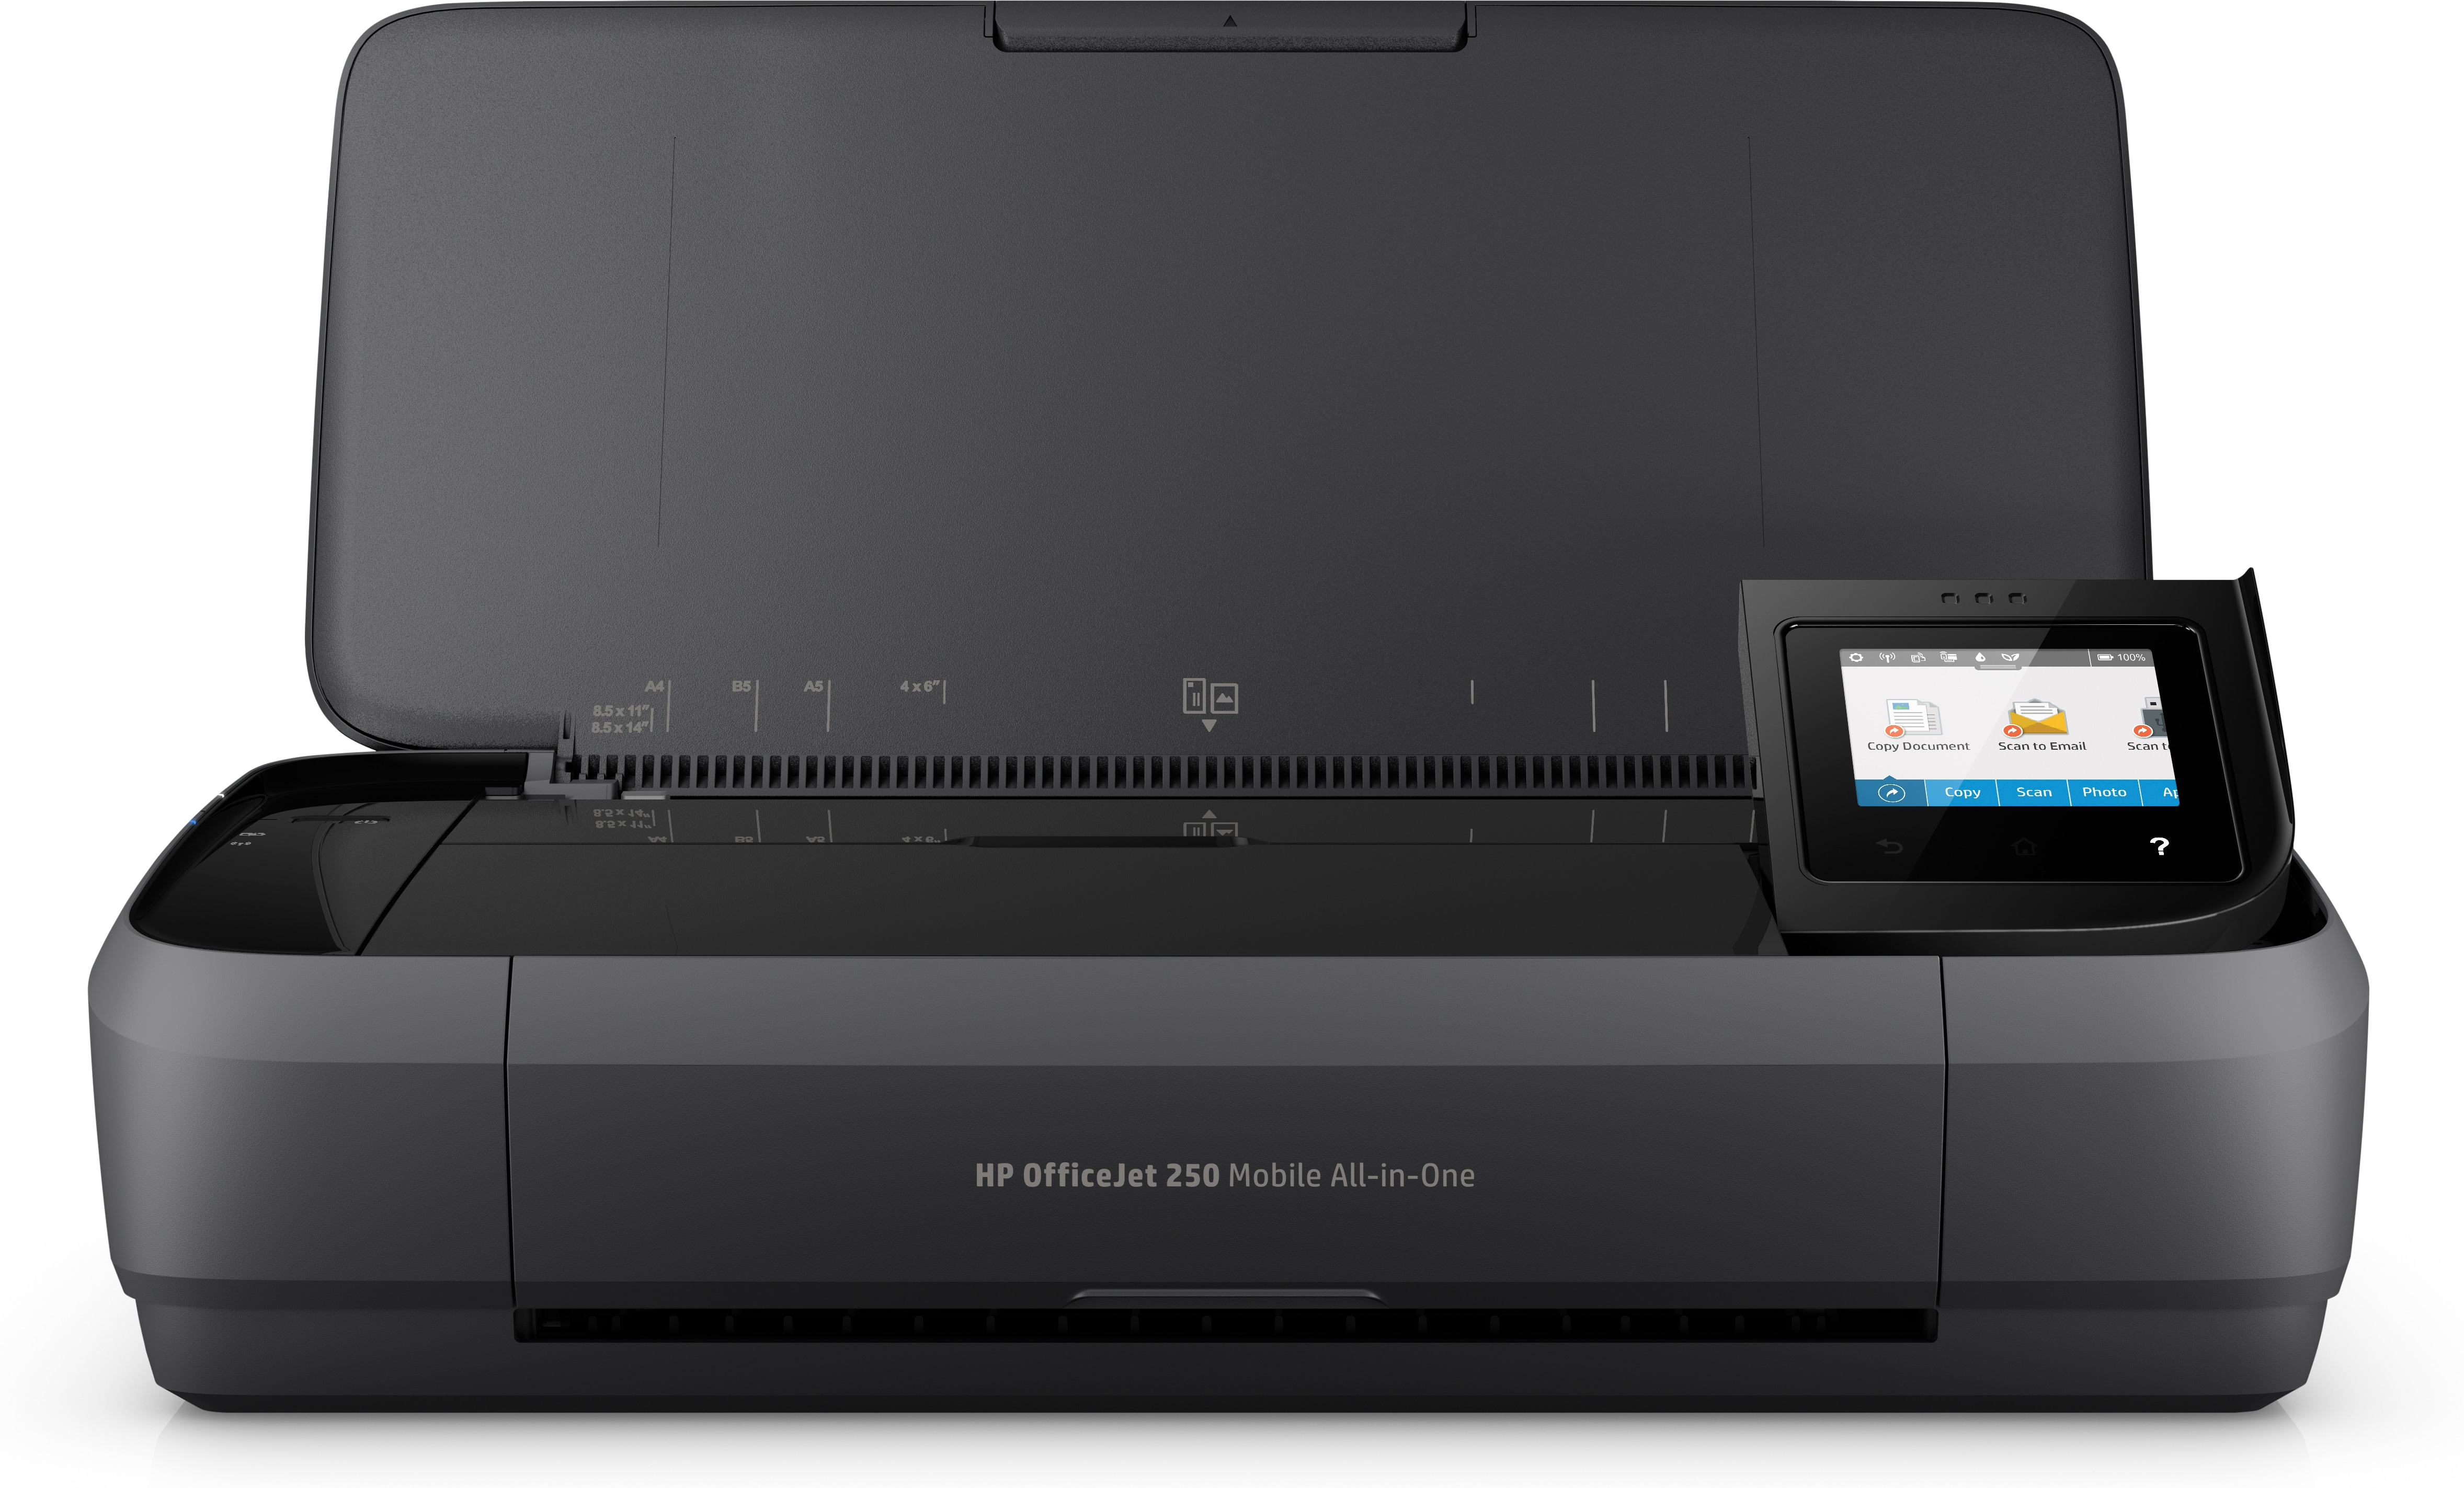 HP OfficeJet 250 Getto termico d'inchiostro 10 ppm 4800 x 1200 DPI A4 Wi-Fi